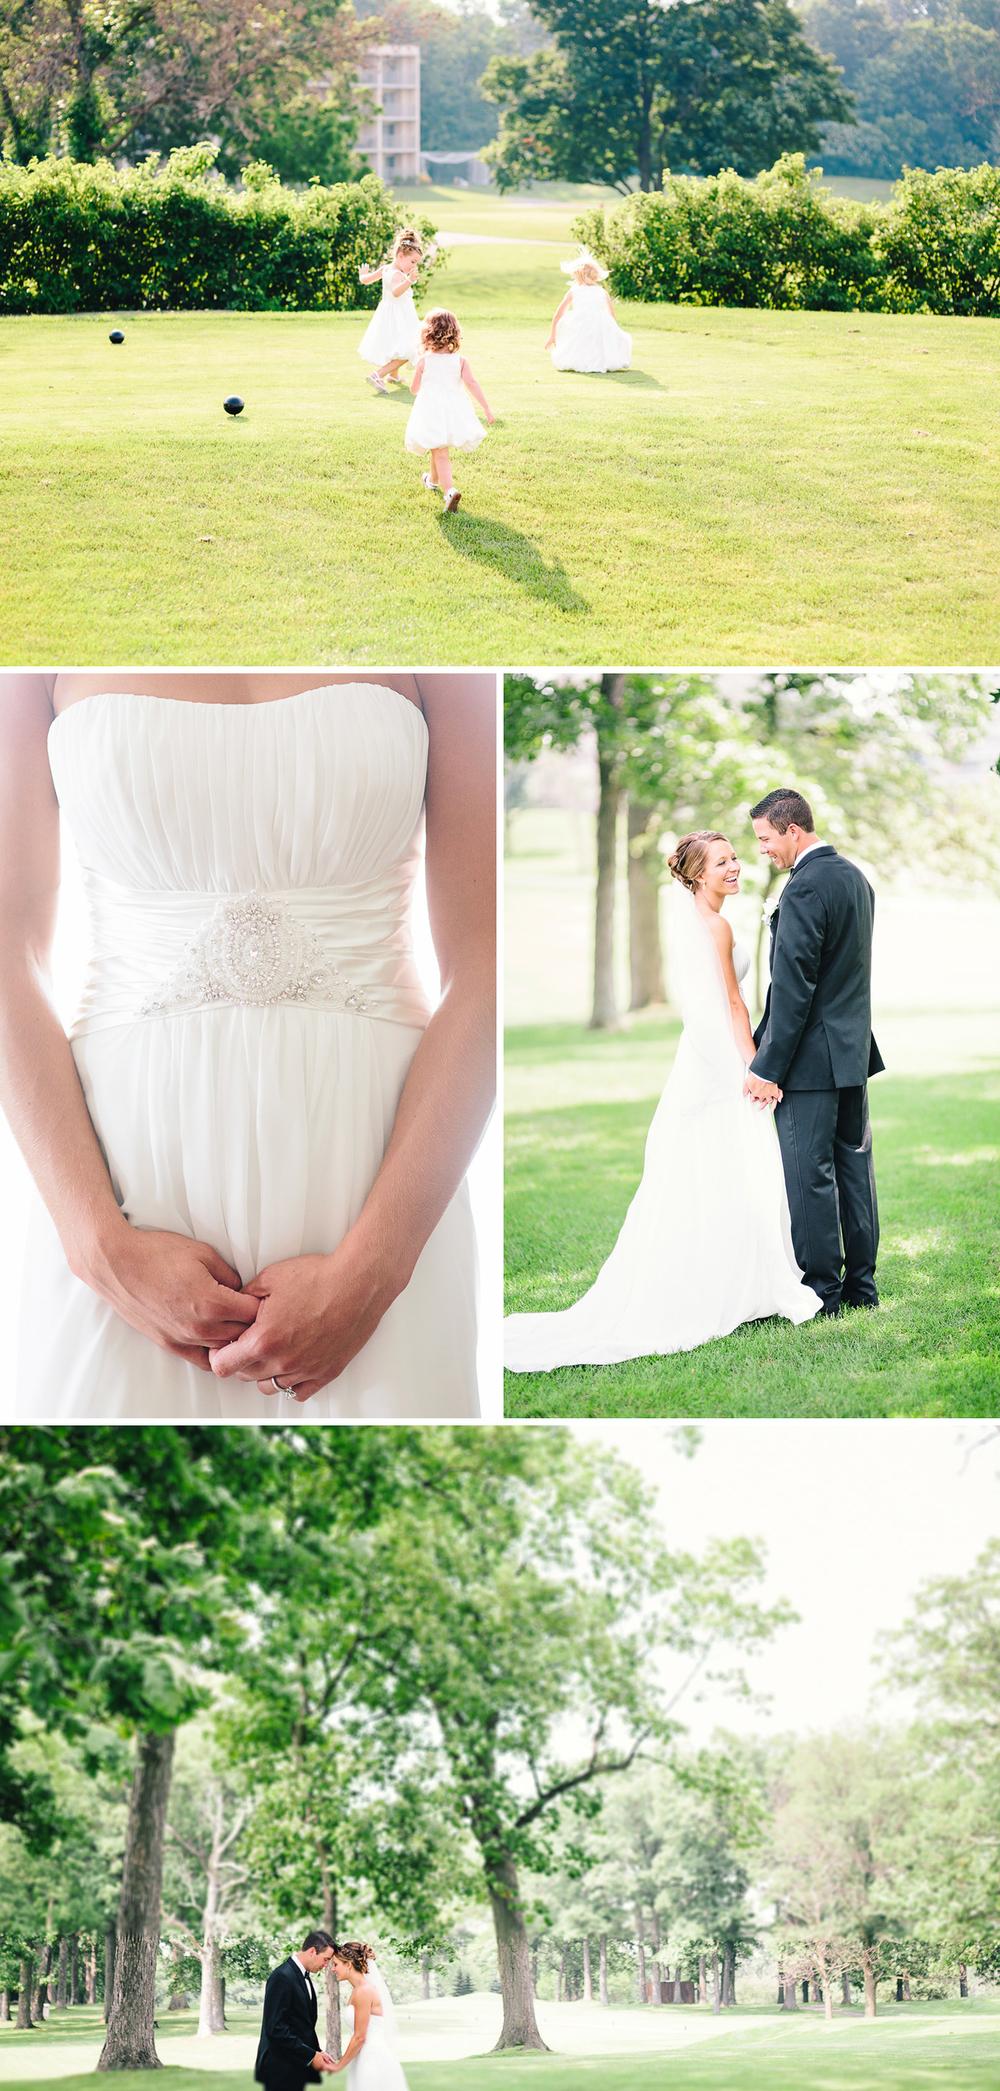 Chicago_Fine_Art_Wedding_Photography_sparks.jpg